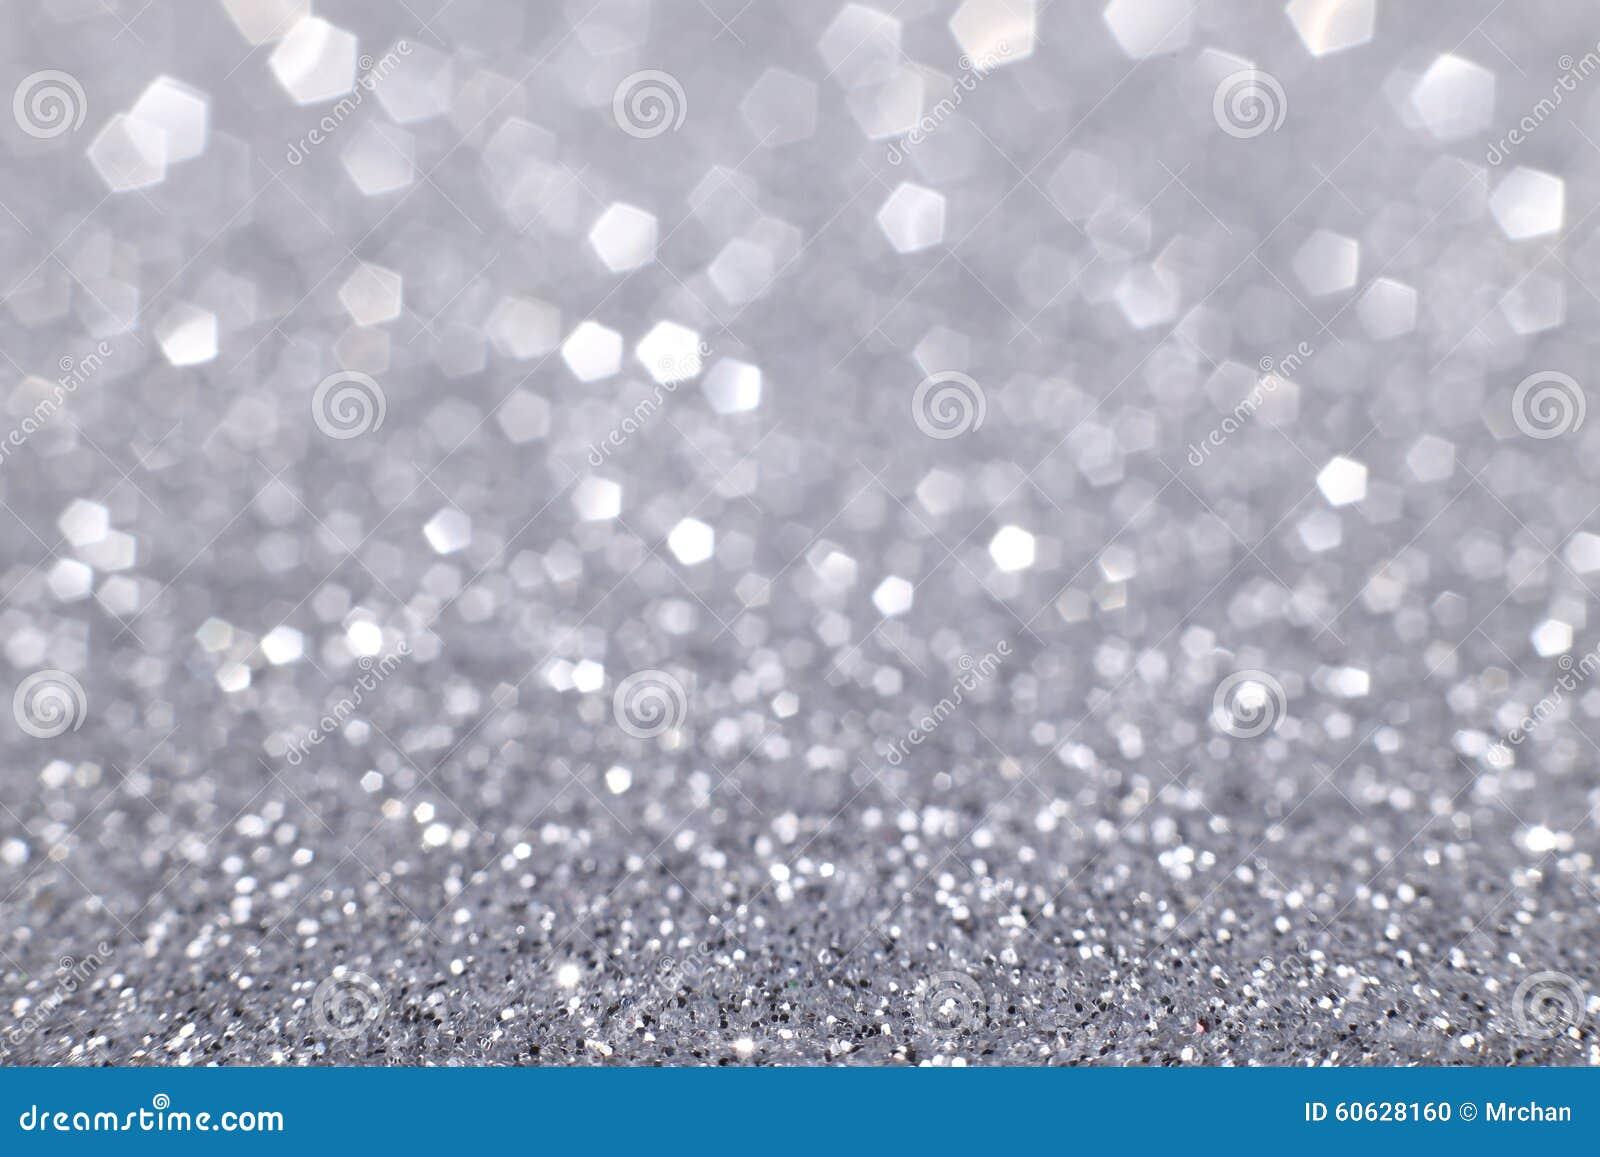 background christmas glitter glittering light silver - Silver Christmas Lights